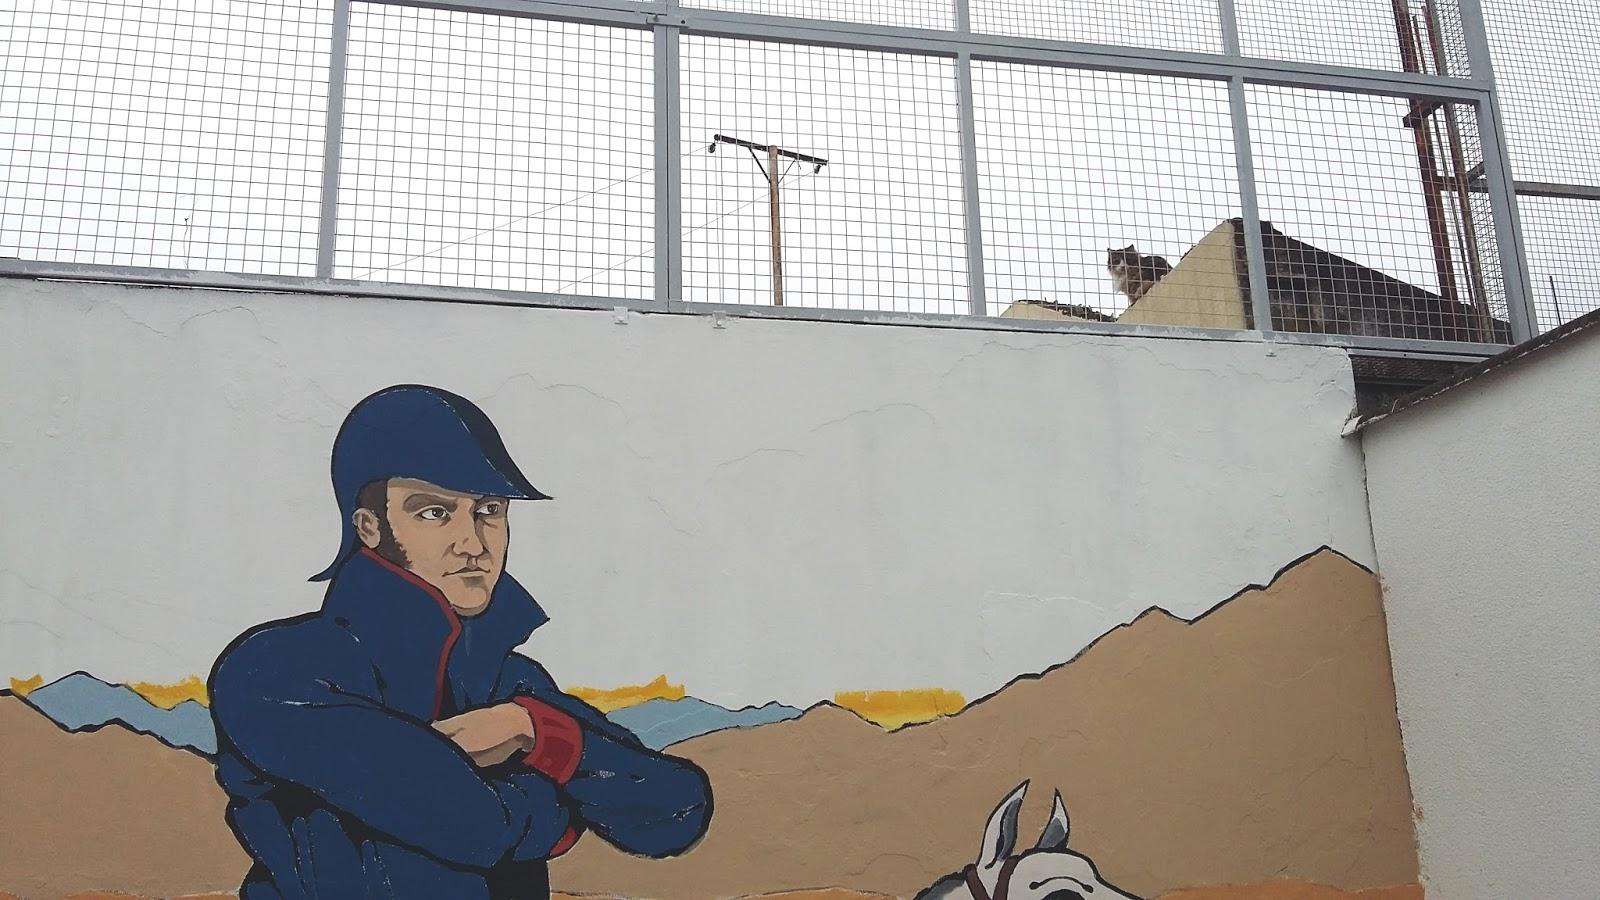 Juan sabatez ej rcito del abate for Planning mural 2017